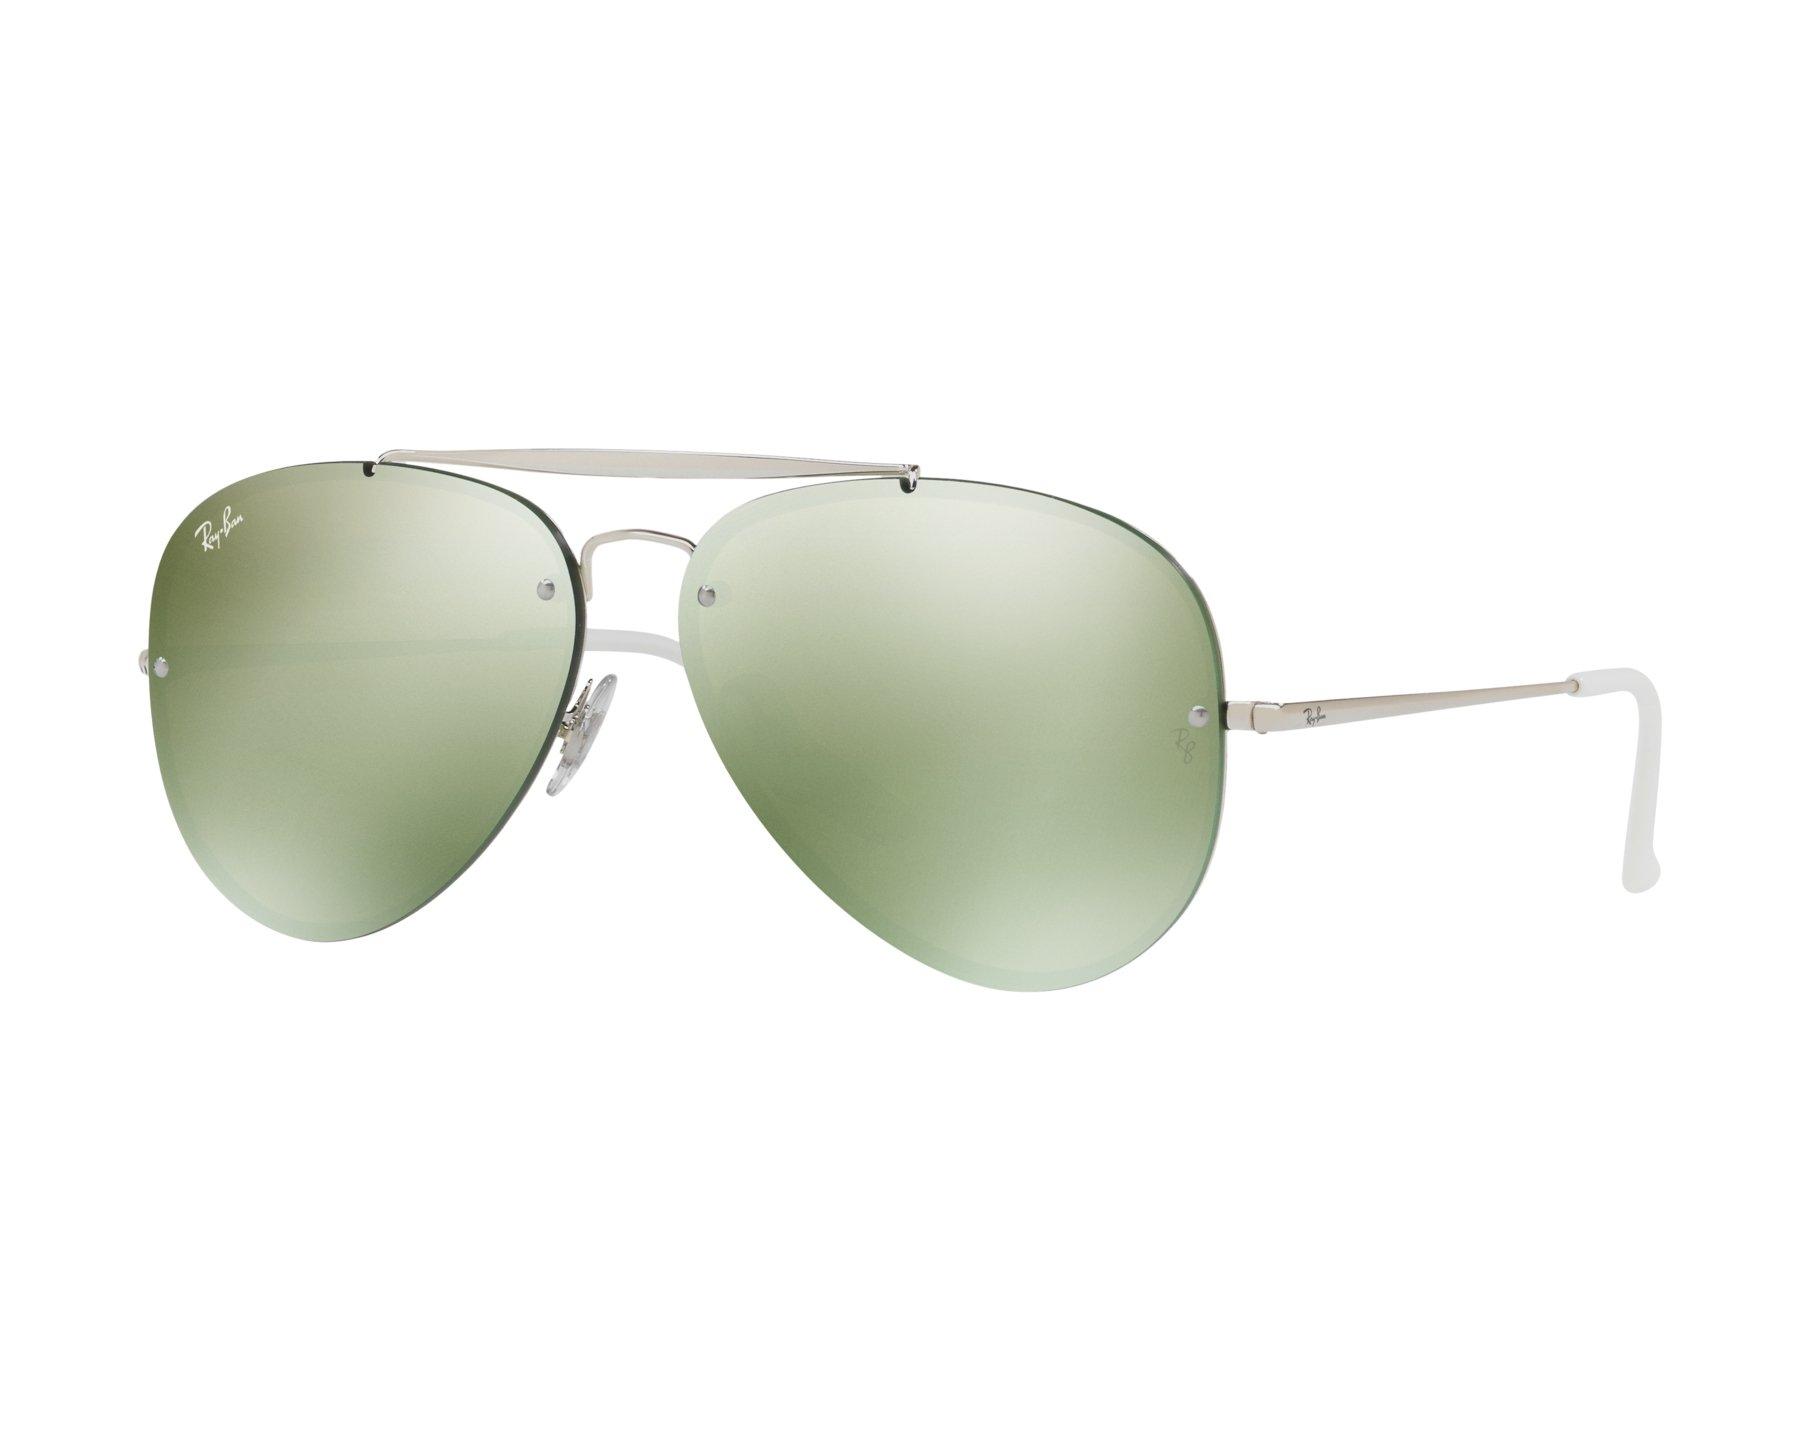 88749b3c3d Ray-Ban Sunglasses Blaze Aviator RB-3584-N 905130